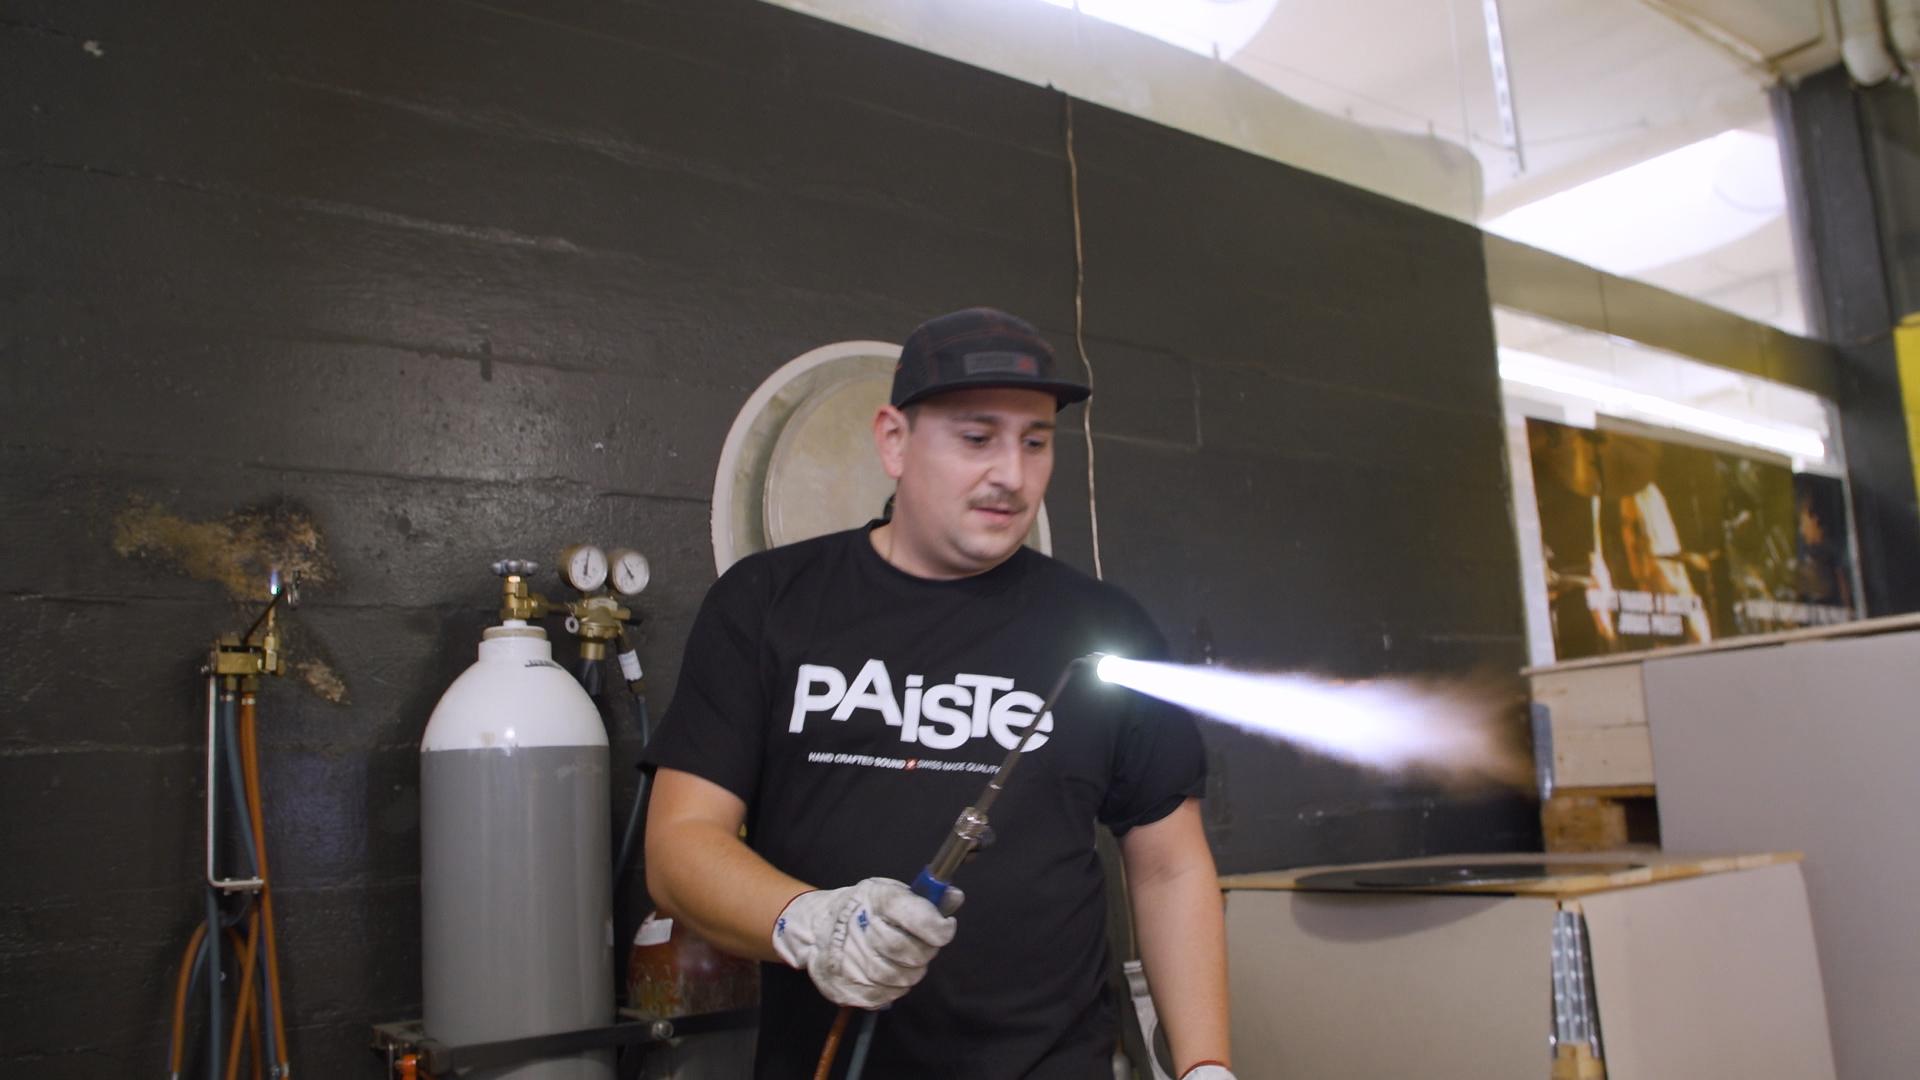 Felix Lehrmann in the Paiste factory, Switzerland